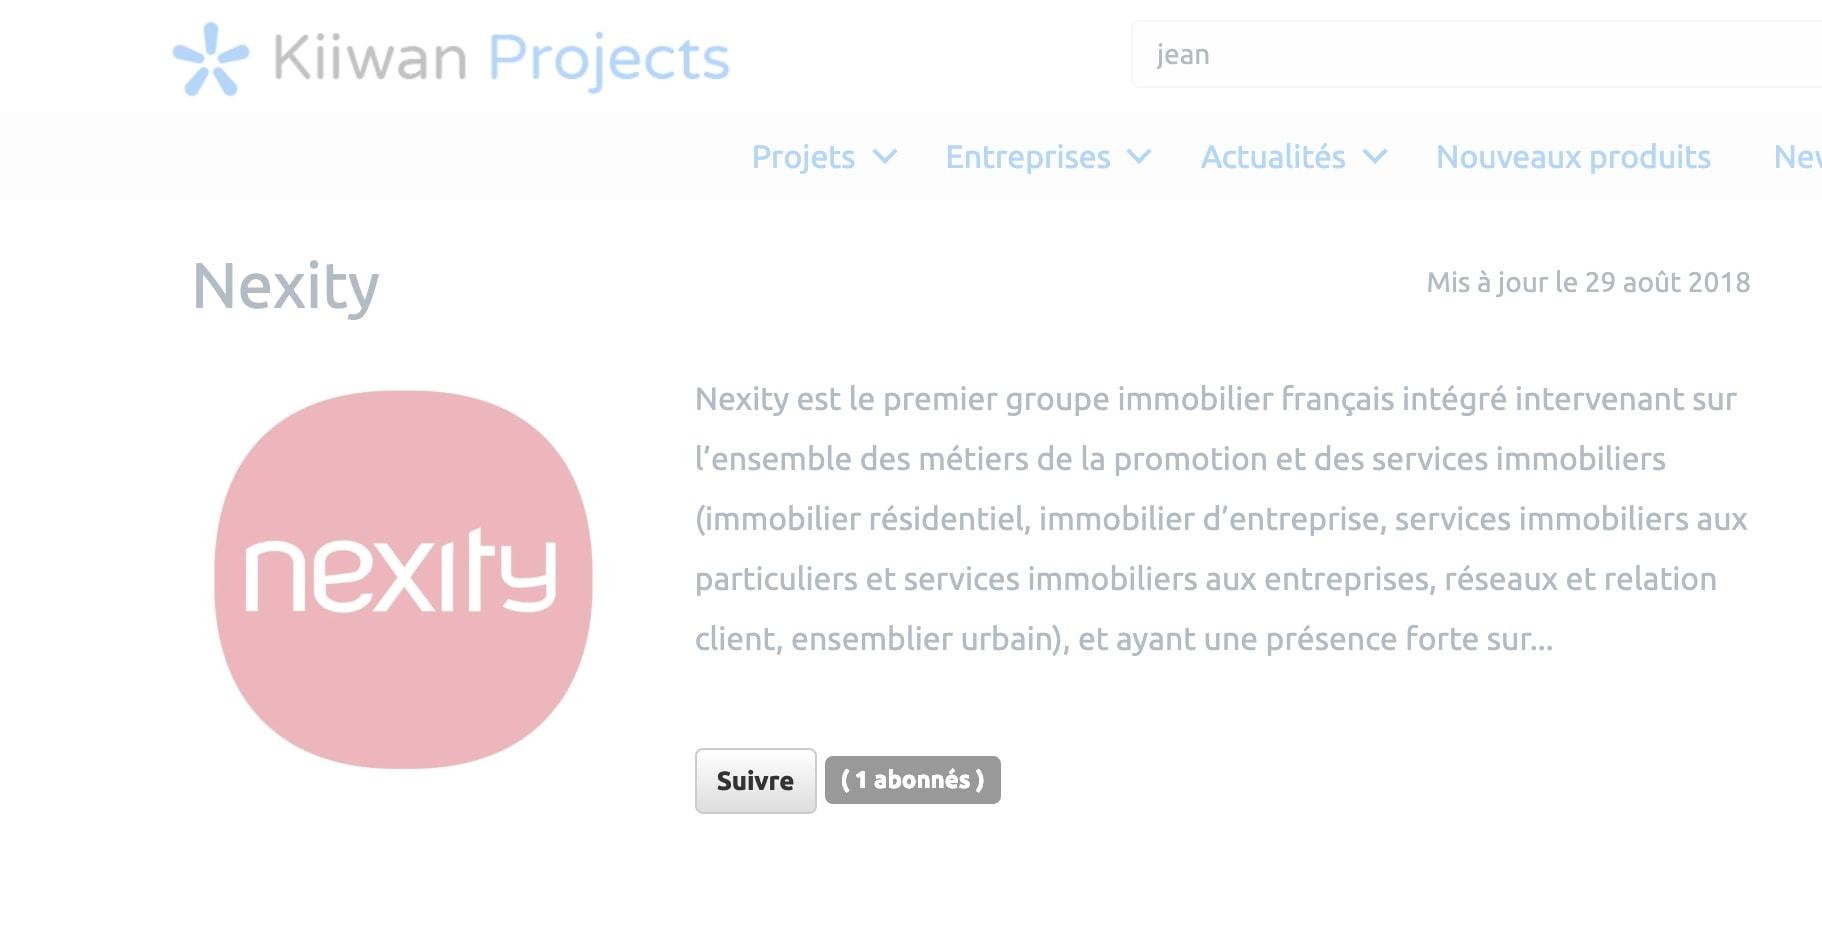 abonnement entreprise kiiwan projects